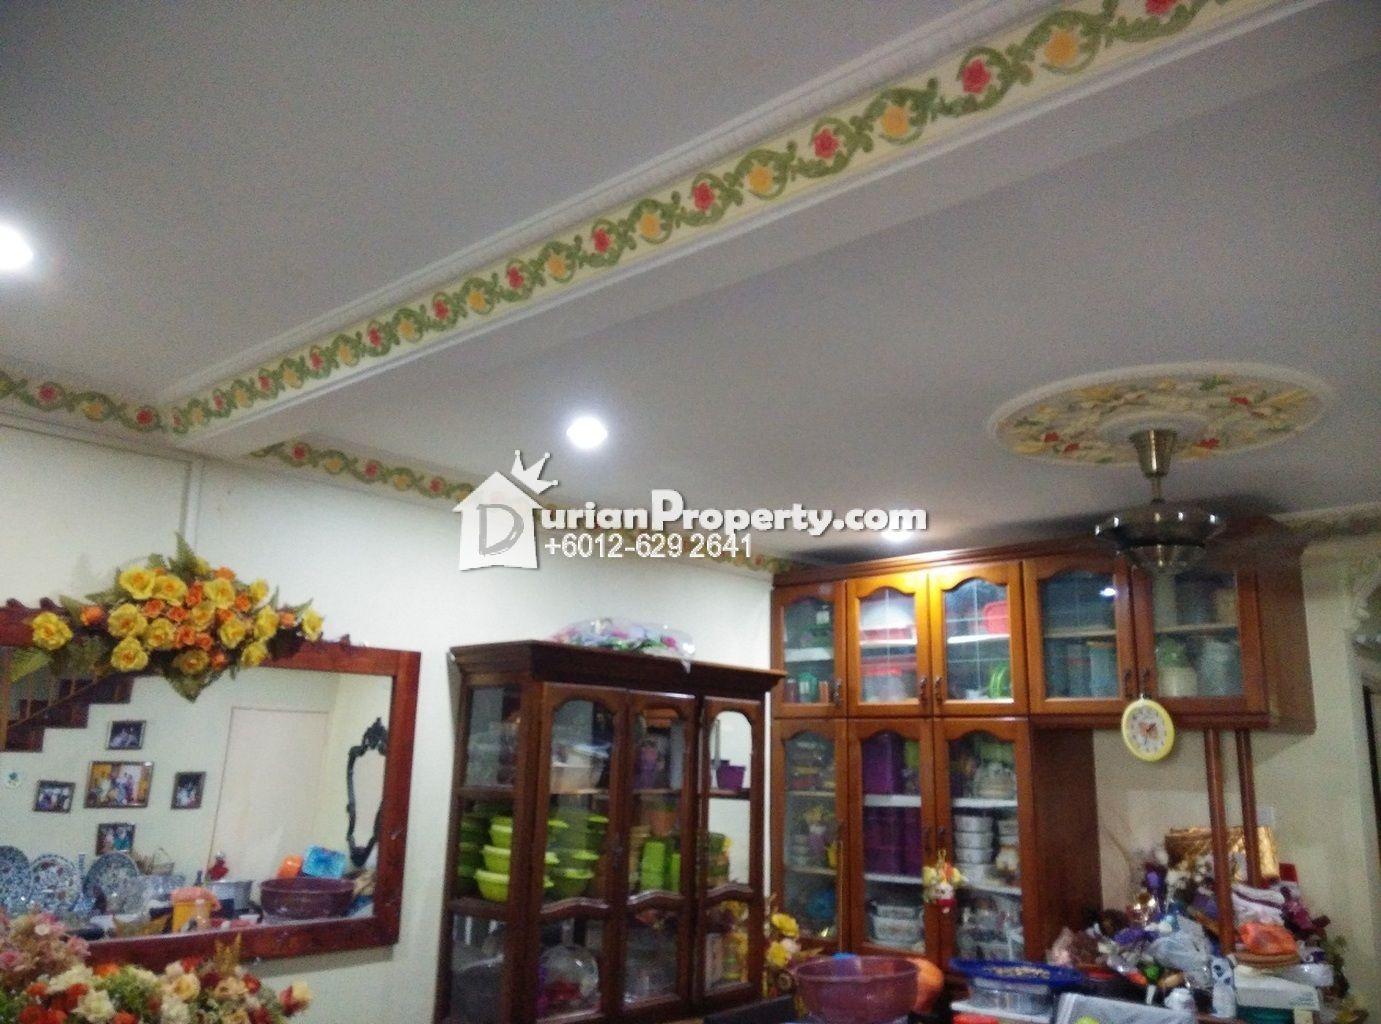 Property for Sale at Pusat Bandar Senawang Property for